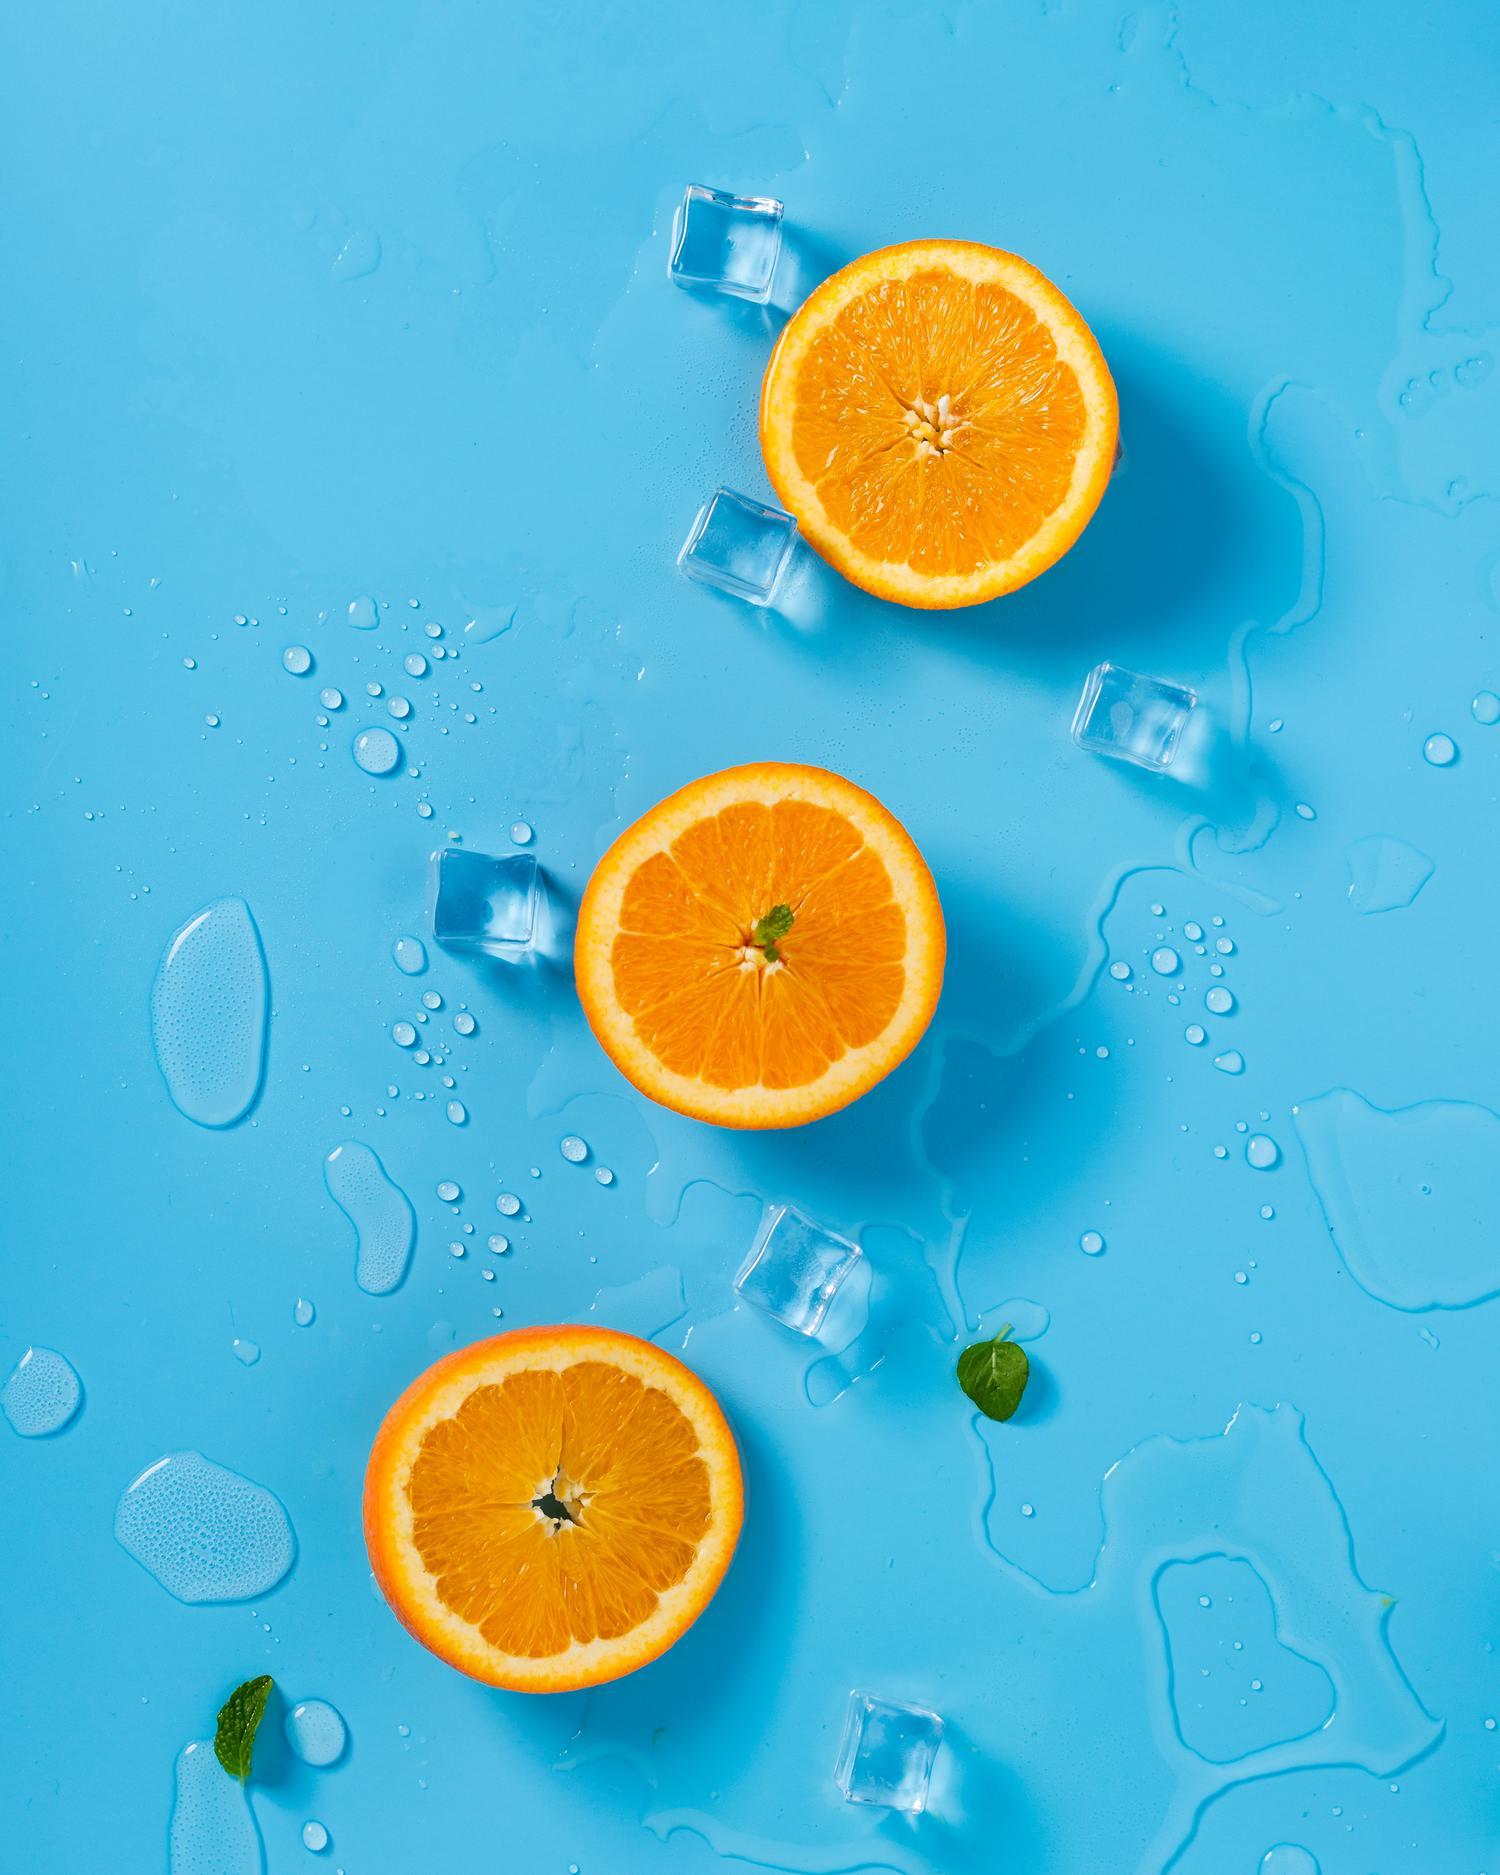 naranjas fondo azul foto producto